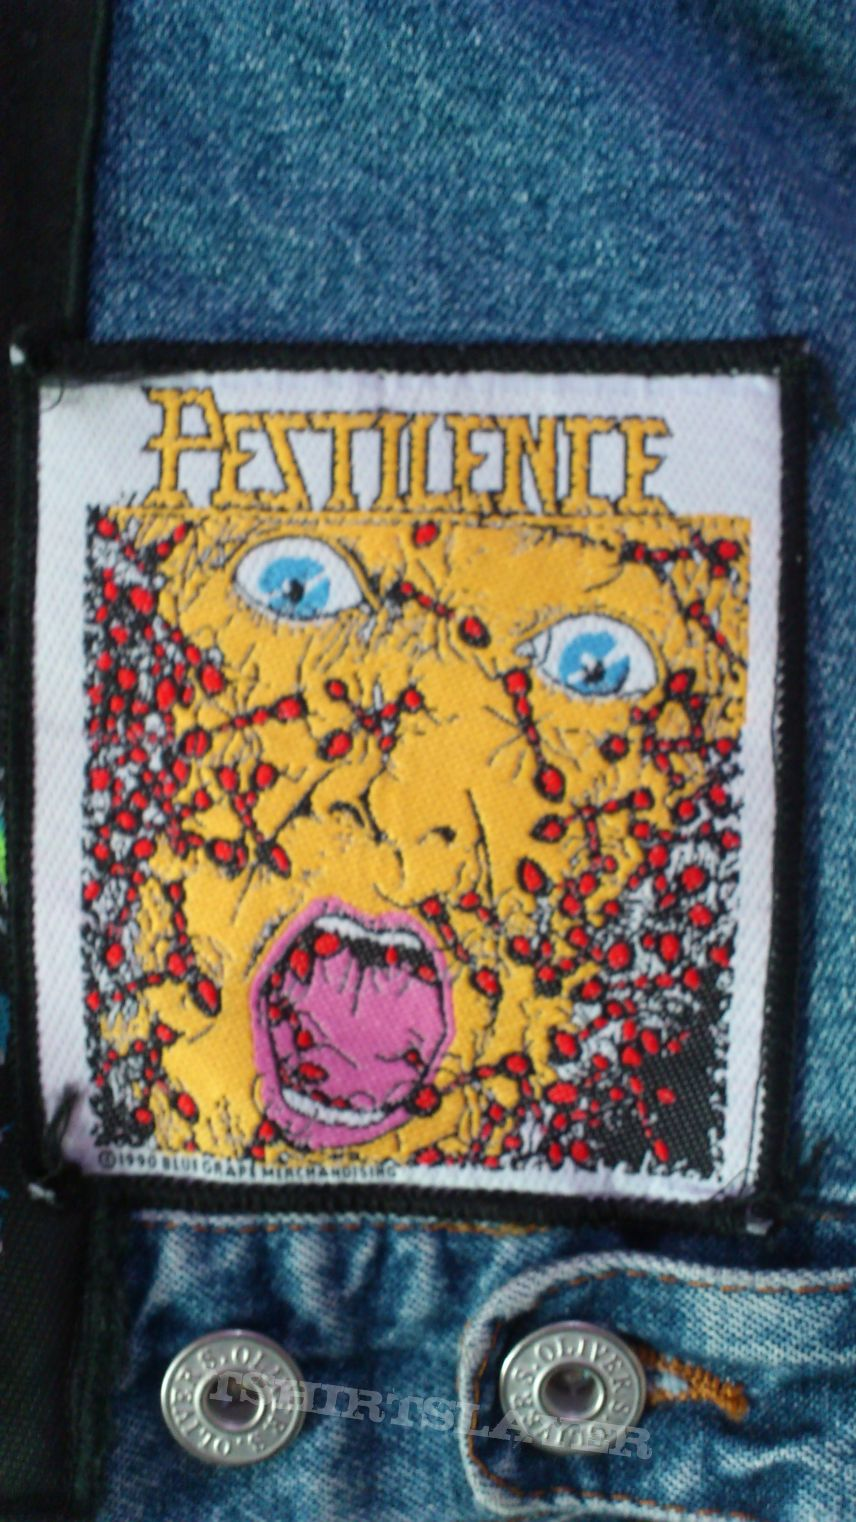 New Patch: Pestilence-Consuming Impulse 1990